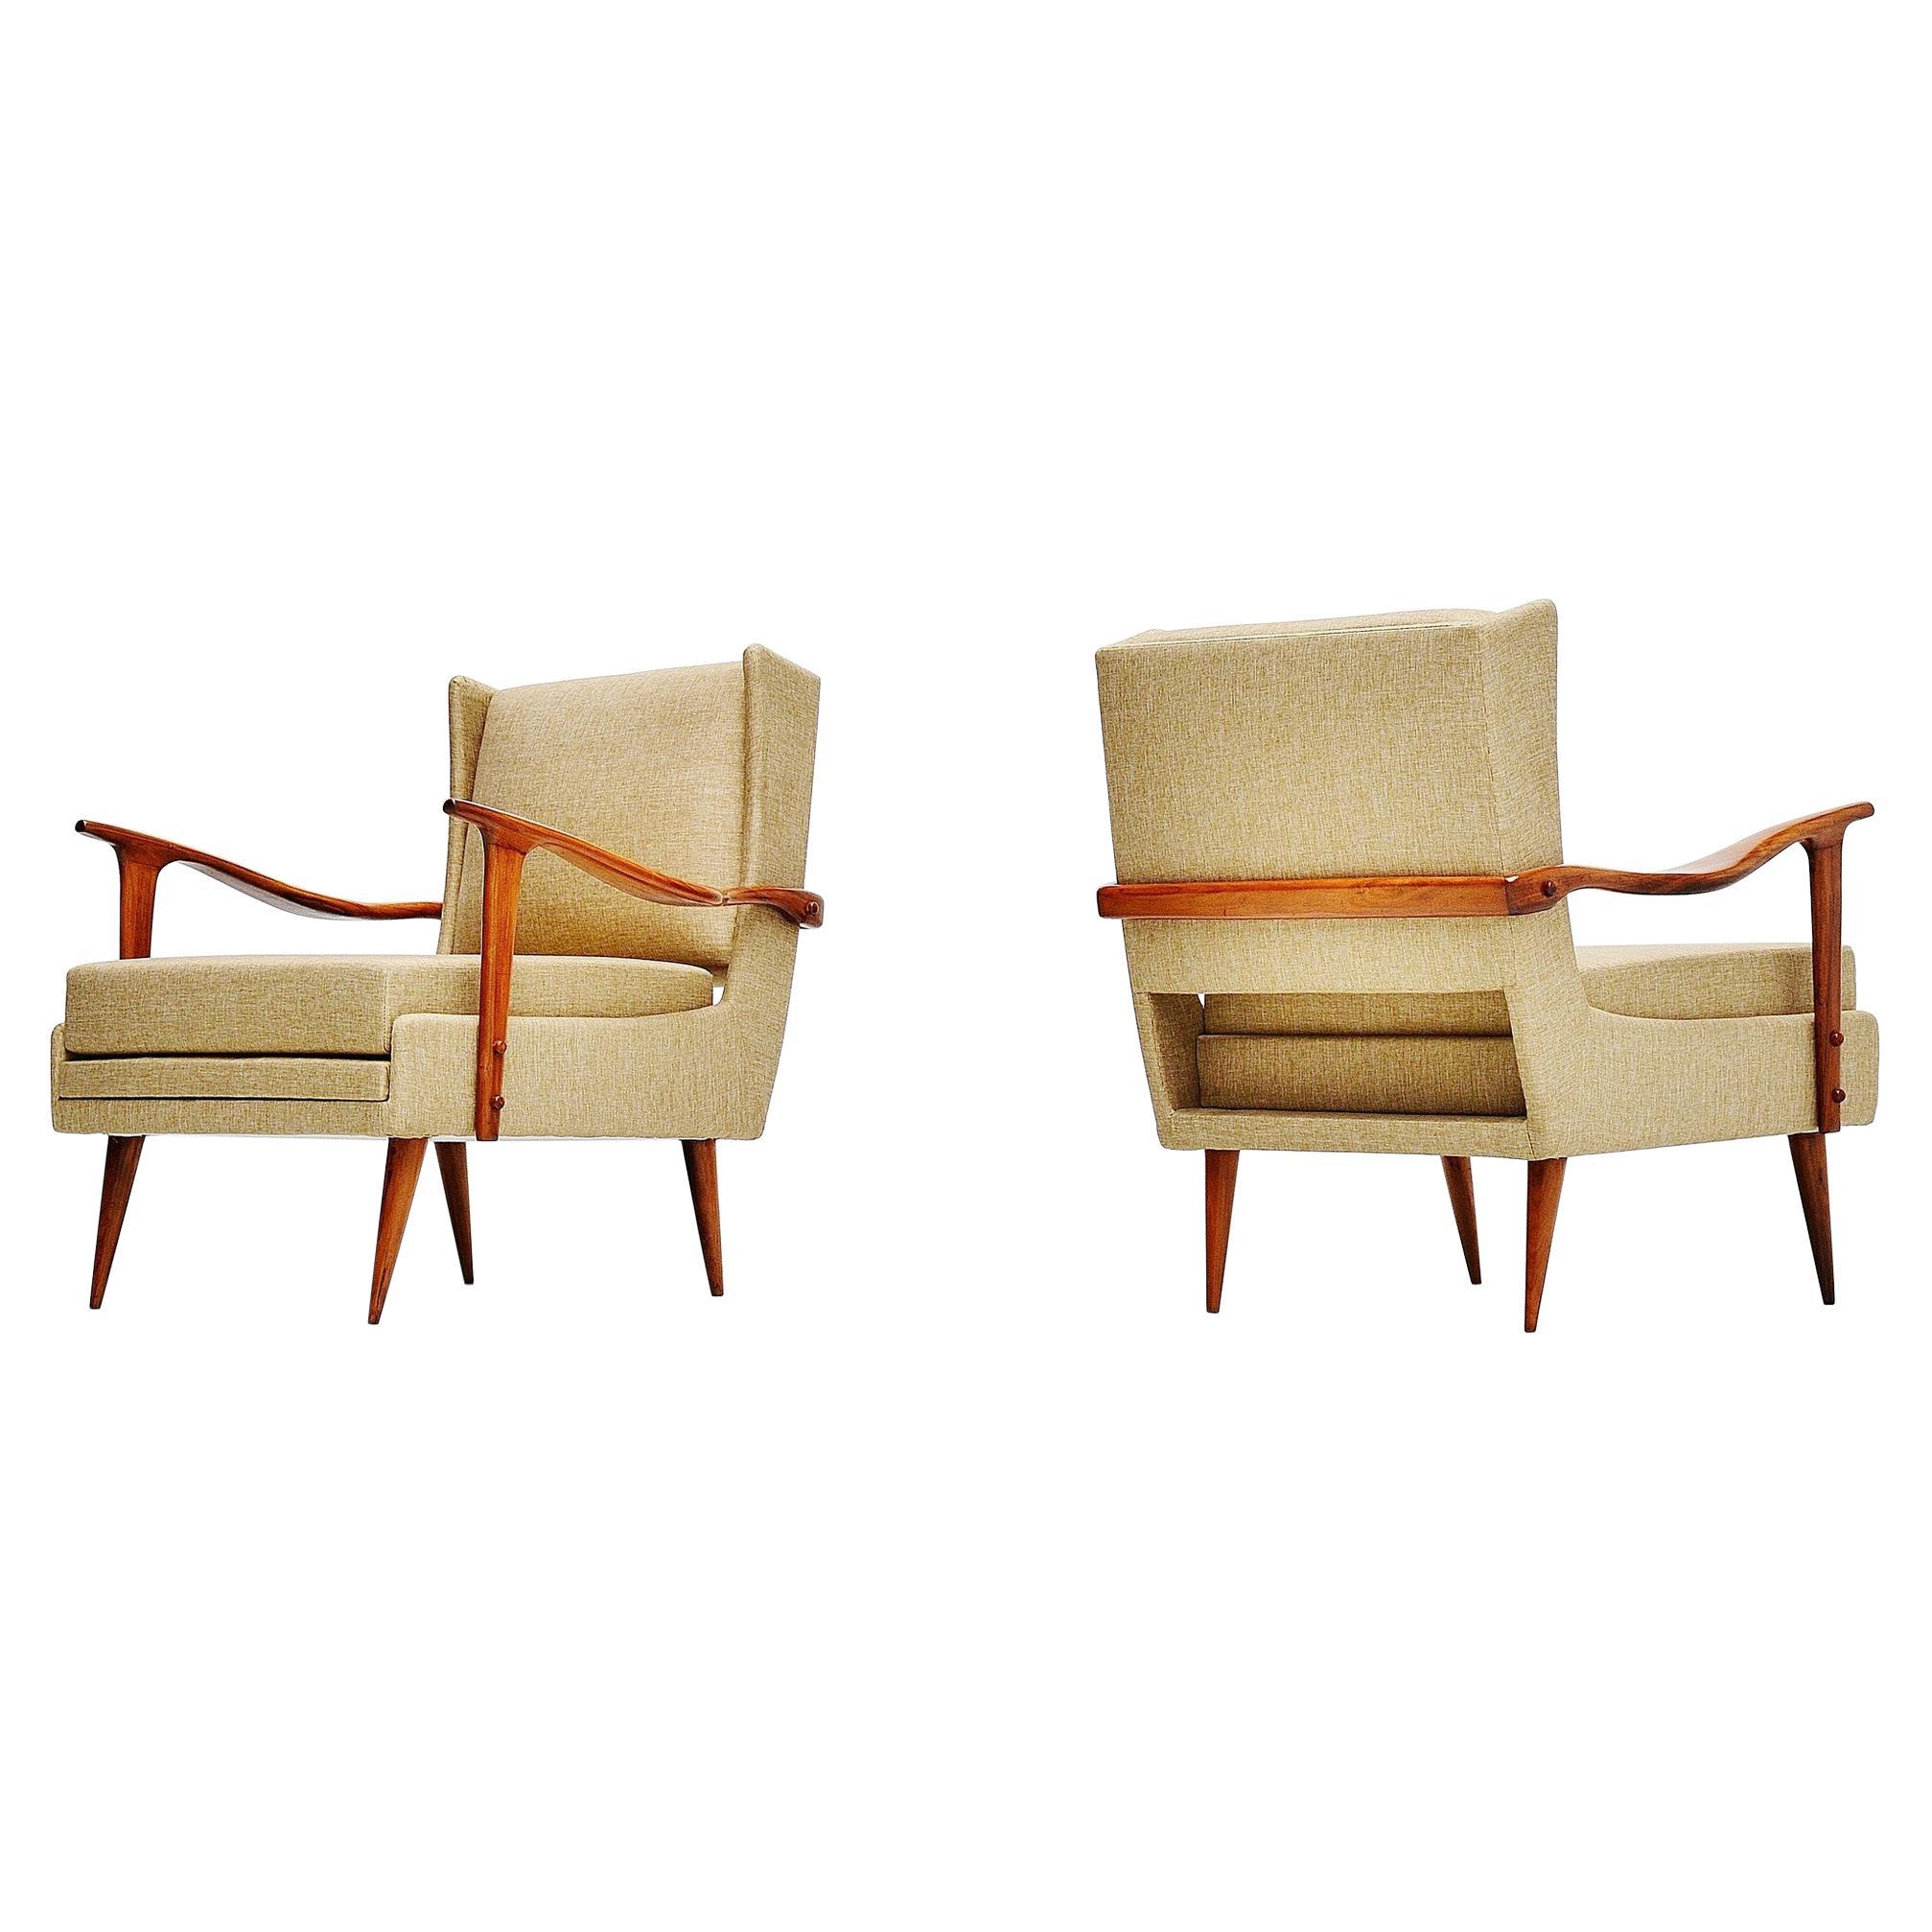 Giuseppe Scapinelli Caviuna Lounge Chairs Pair, Brazil, 1955